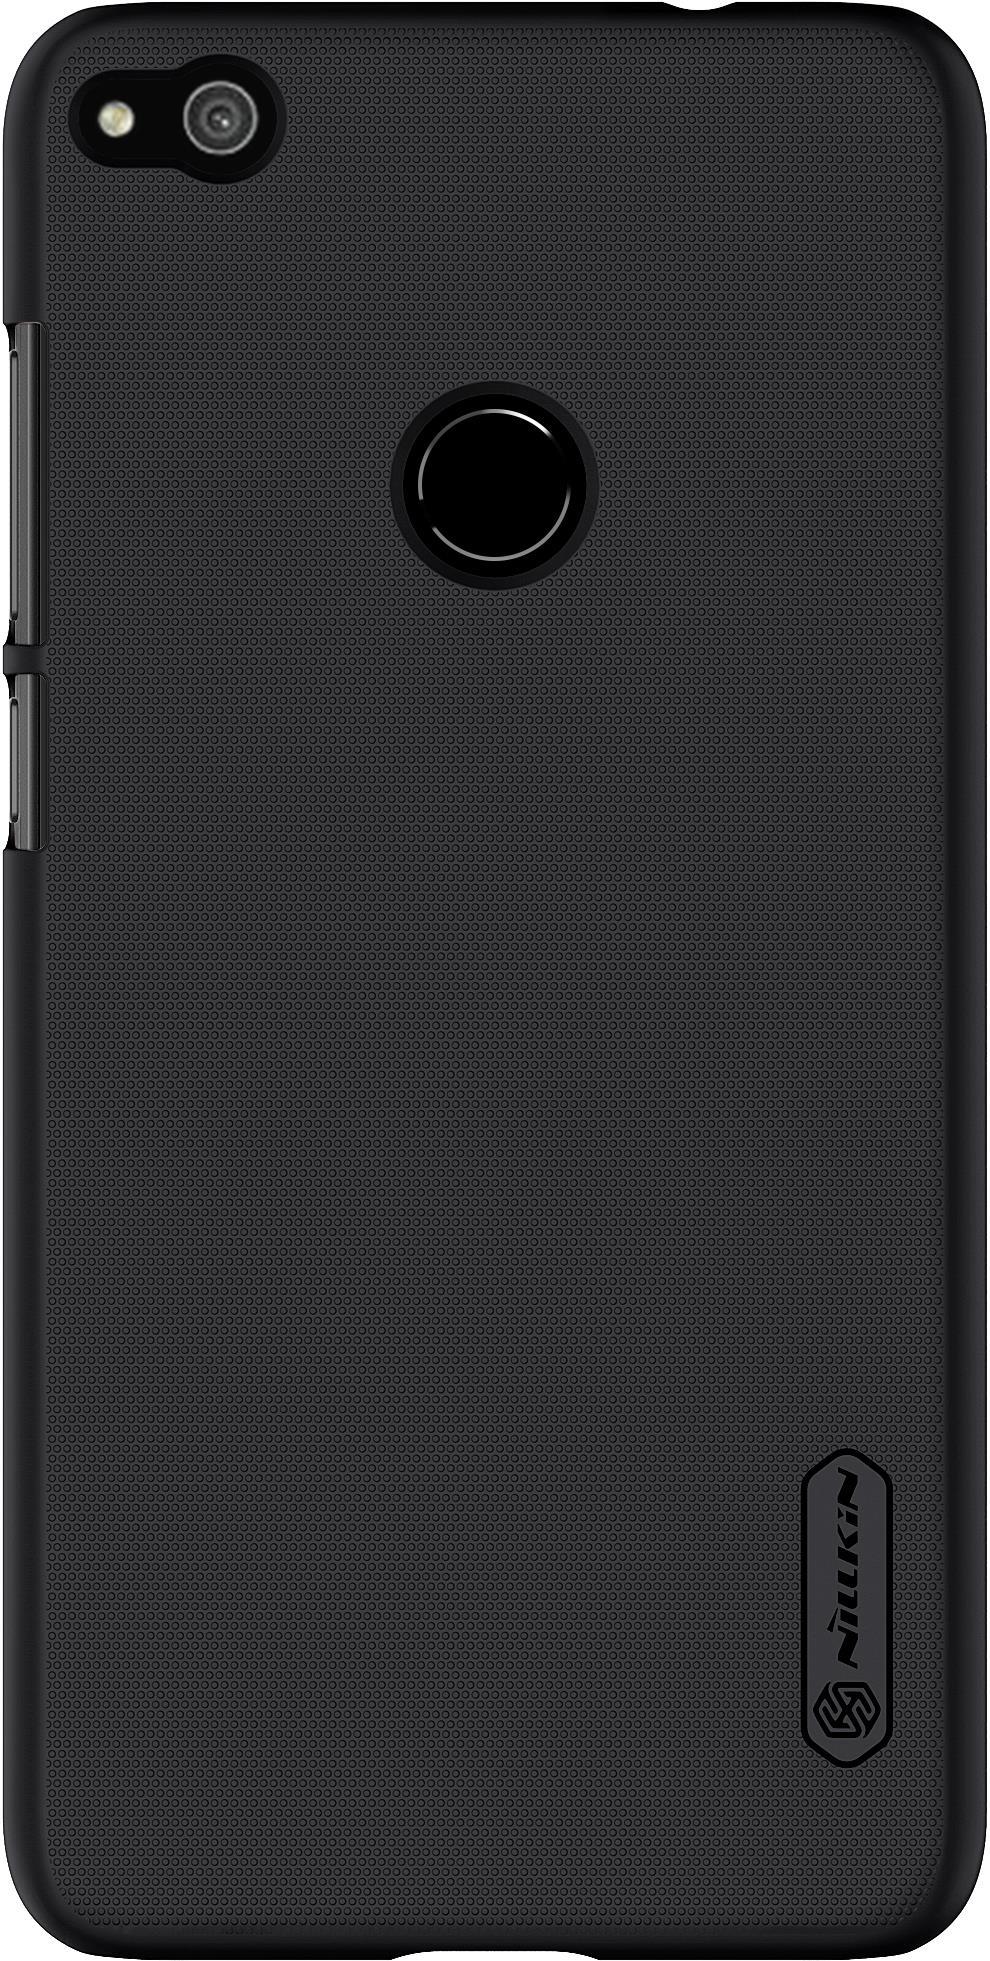 Пластиковый чехол Nillkin для Huawei P8 Lite (2017)/Honor 8 Lite painted pink flamingo pu leather case cover for huawei p8 lite